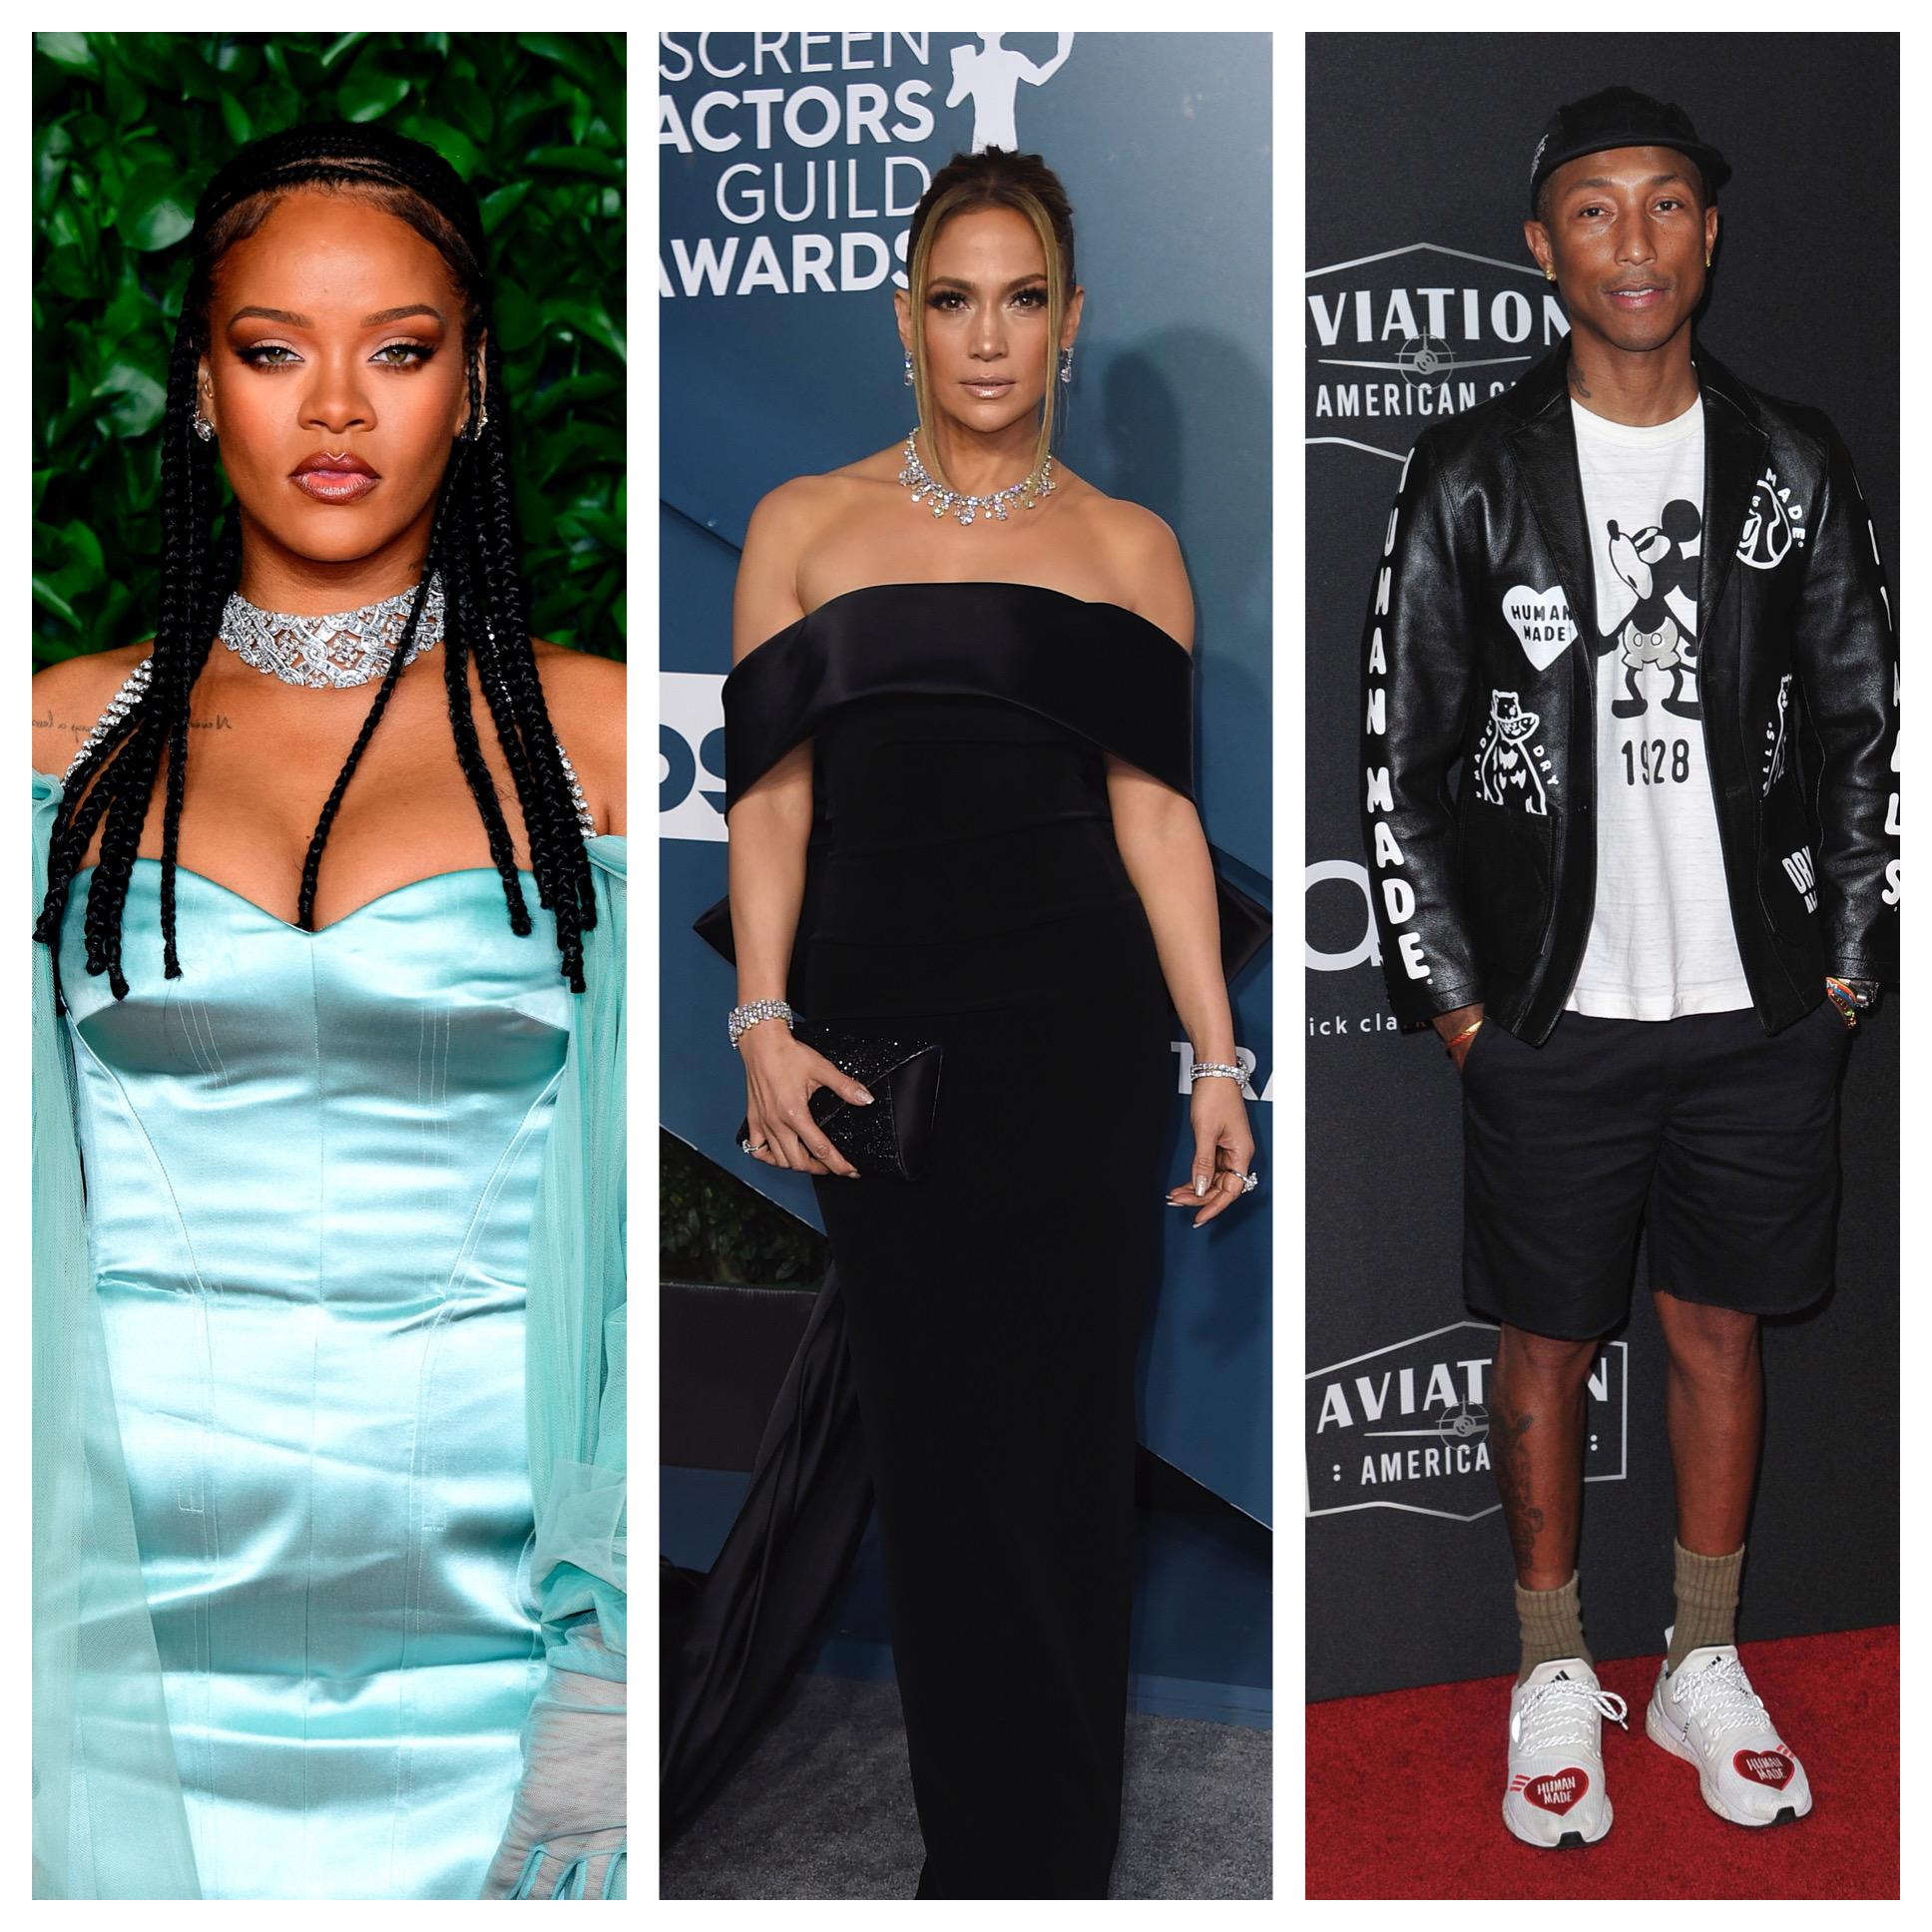 Celebrity Skin Care Lines of 2020